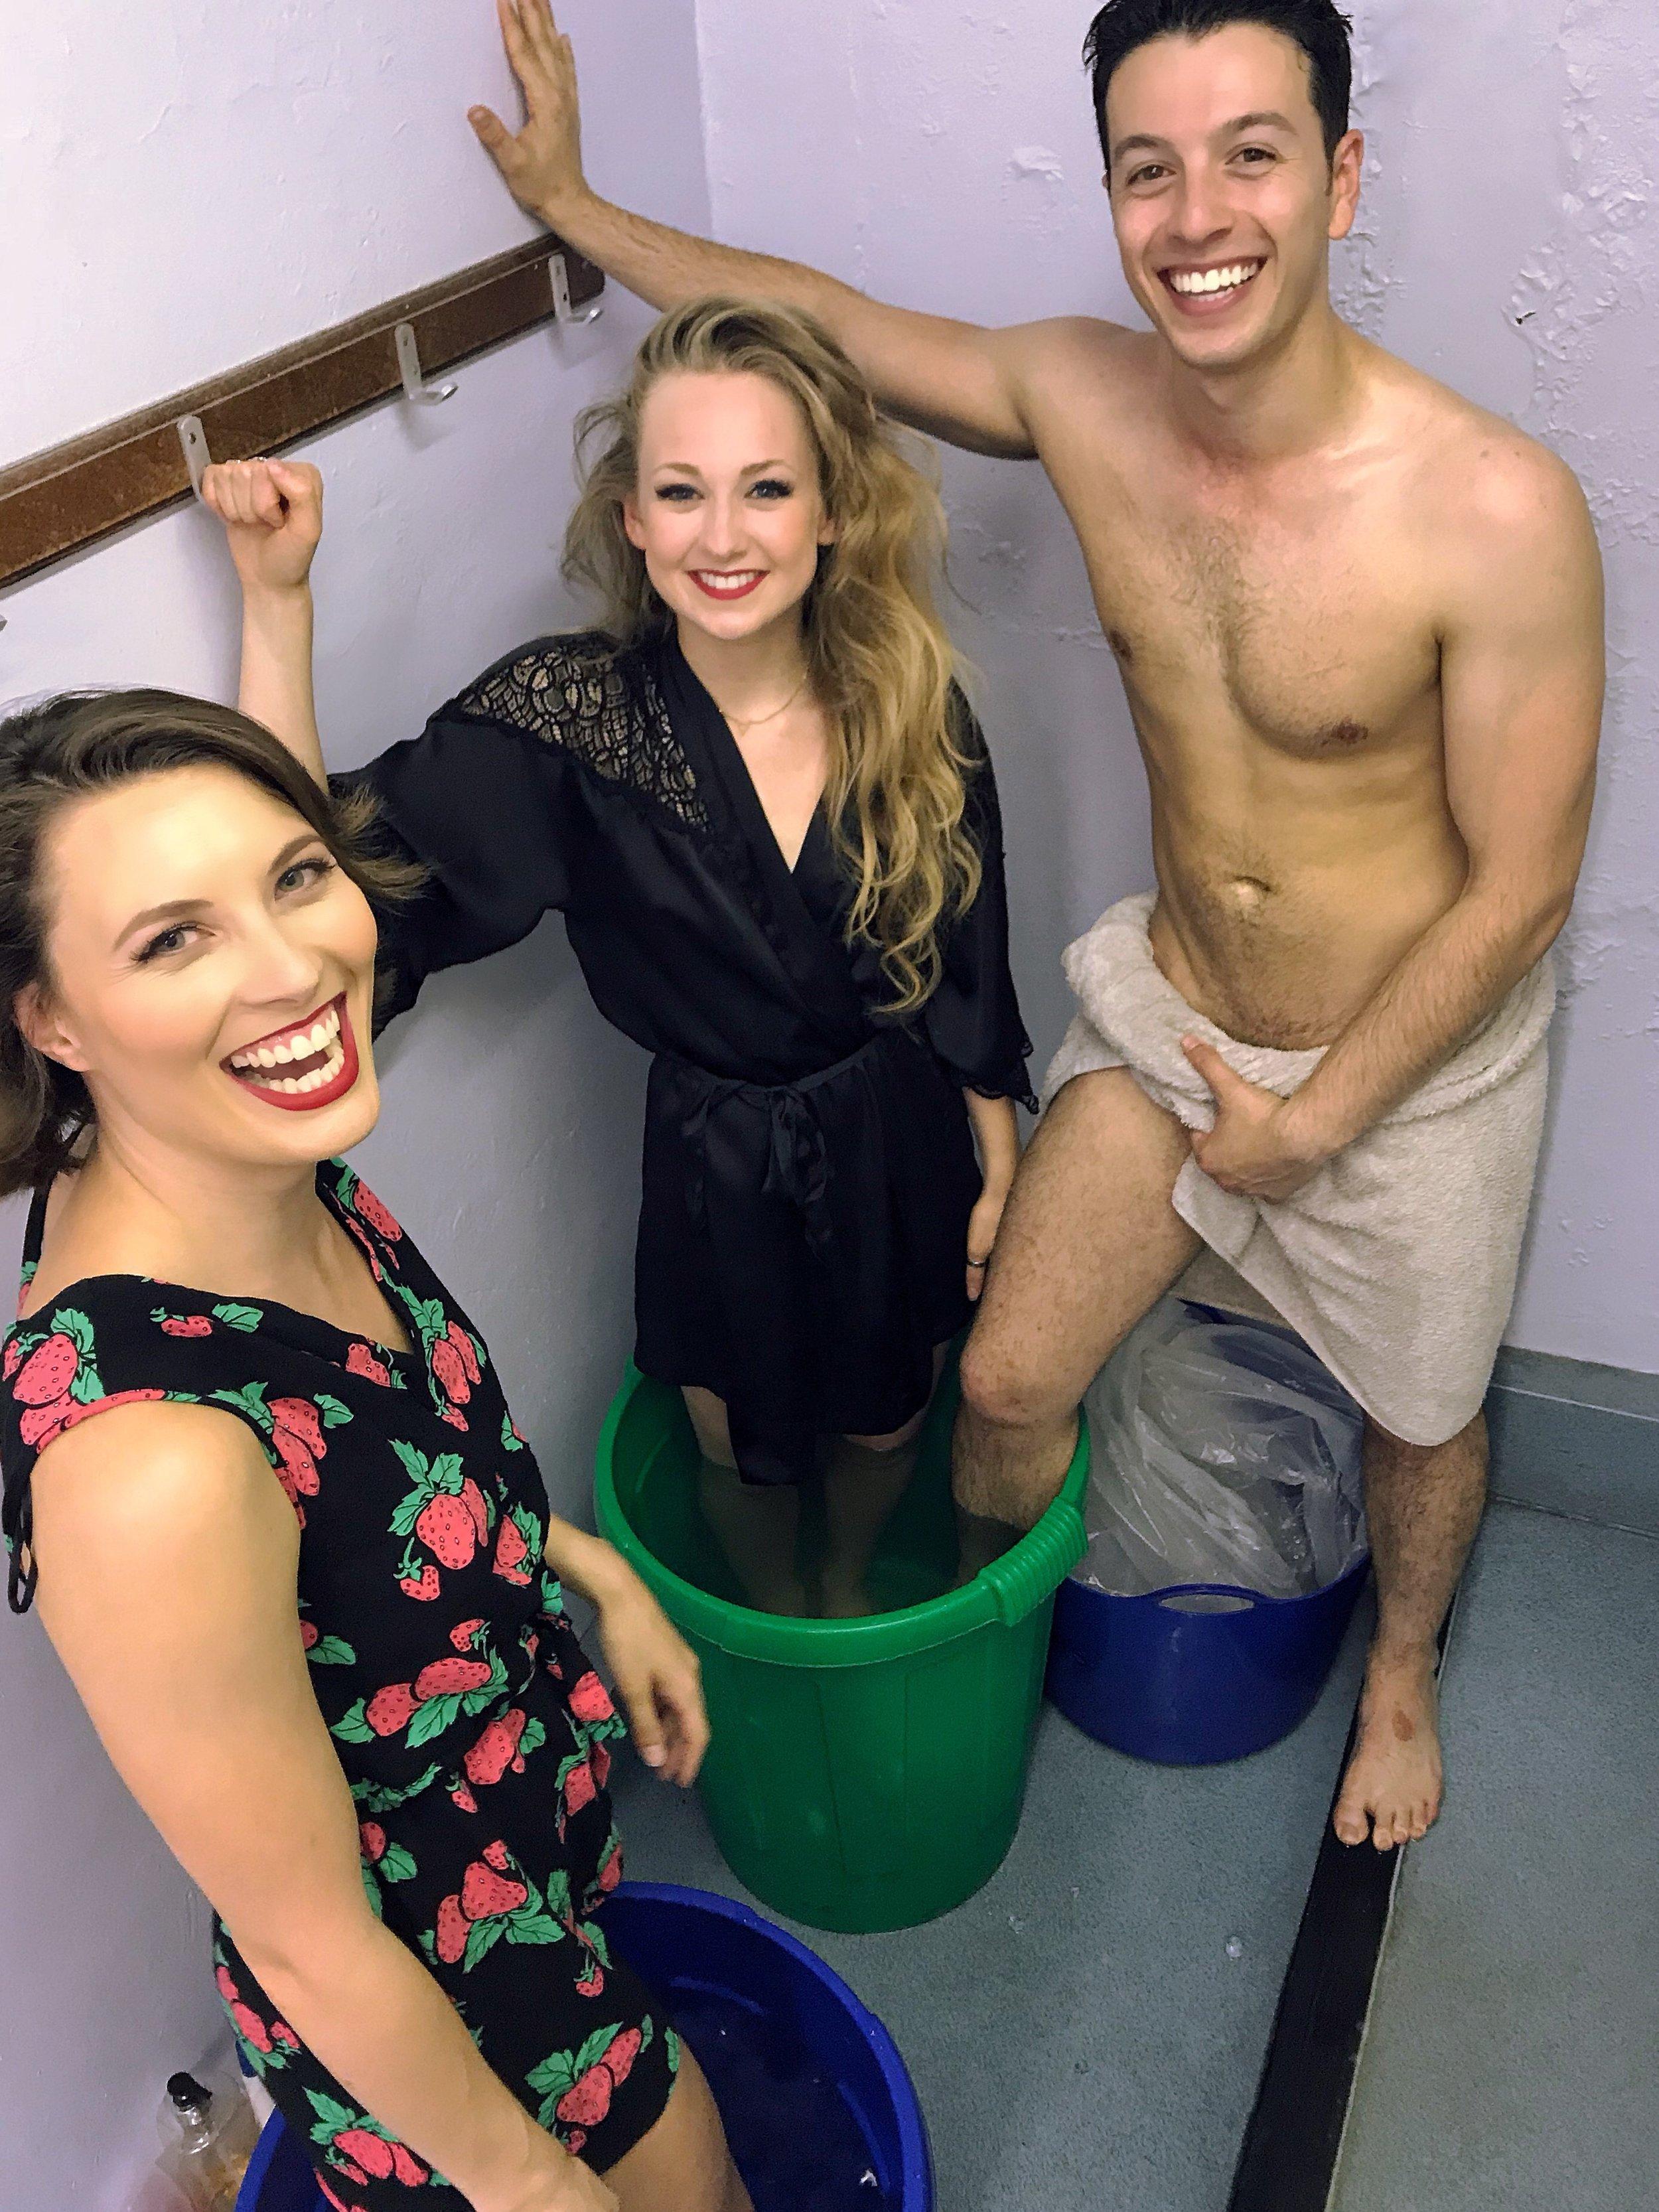 Maria Garrett, James-Royden Lyley and Josephina Camble